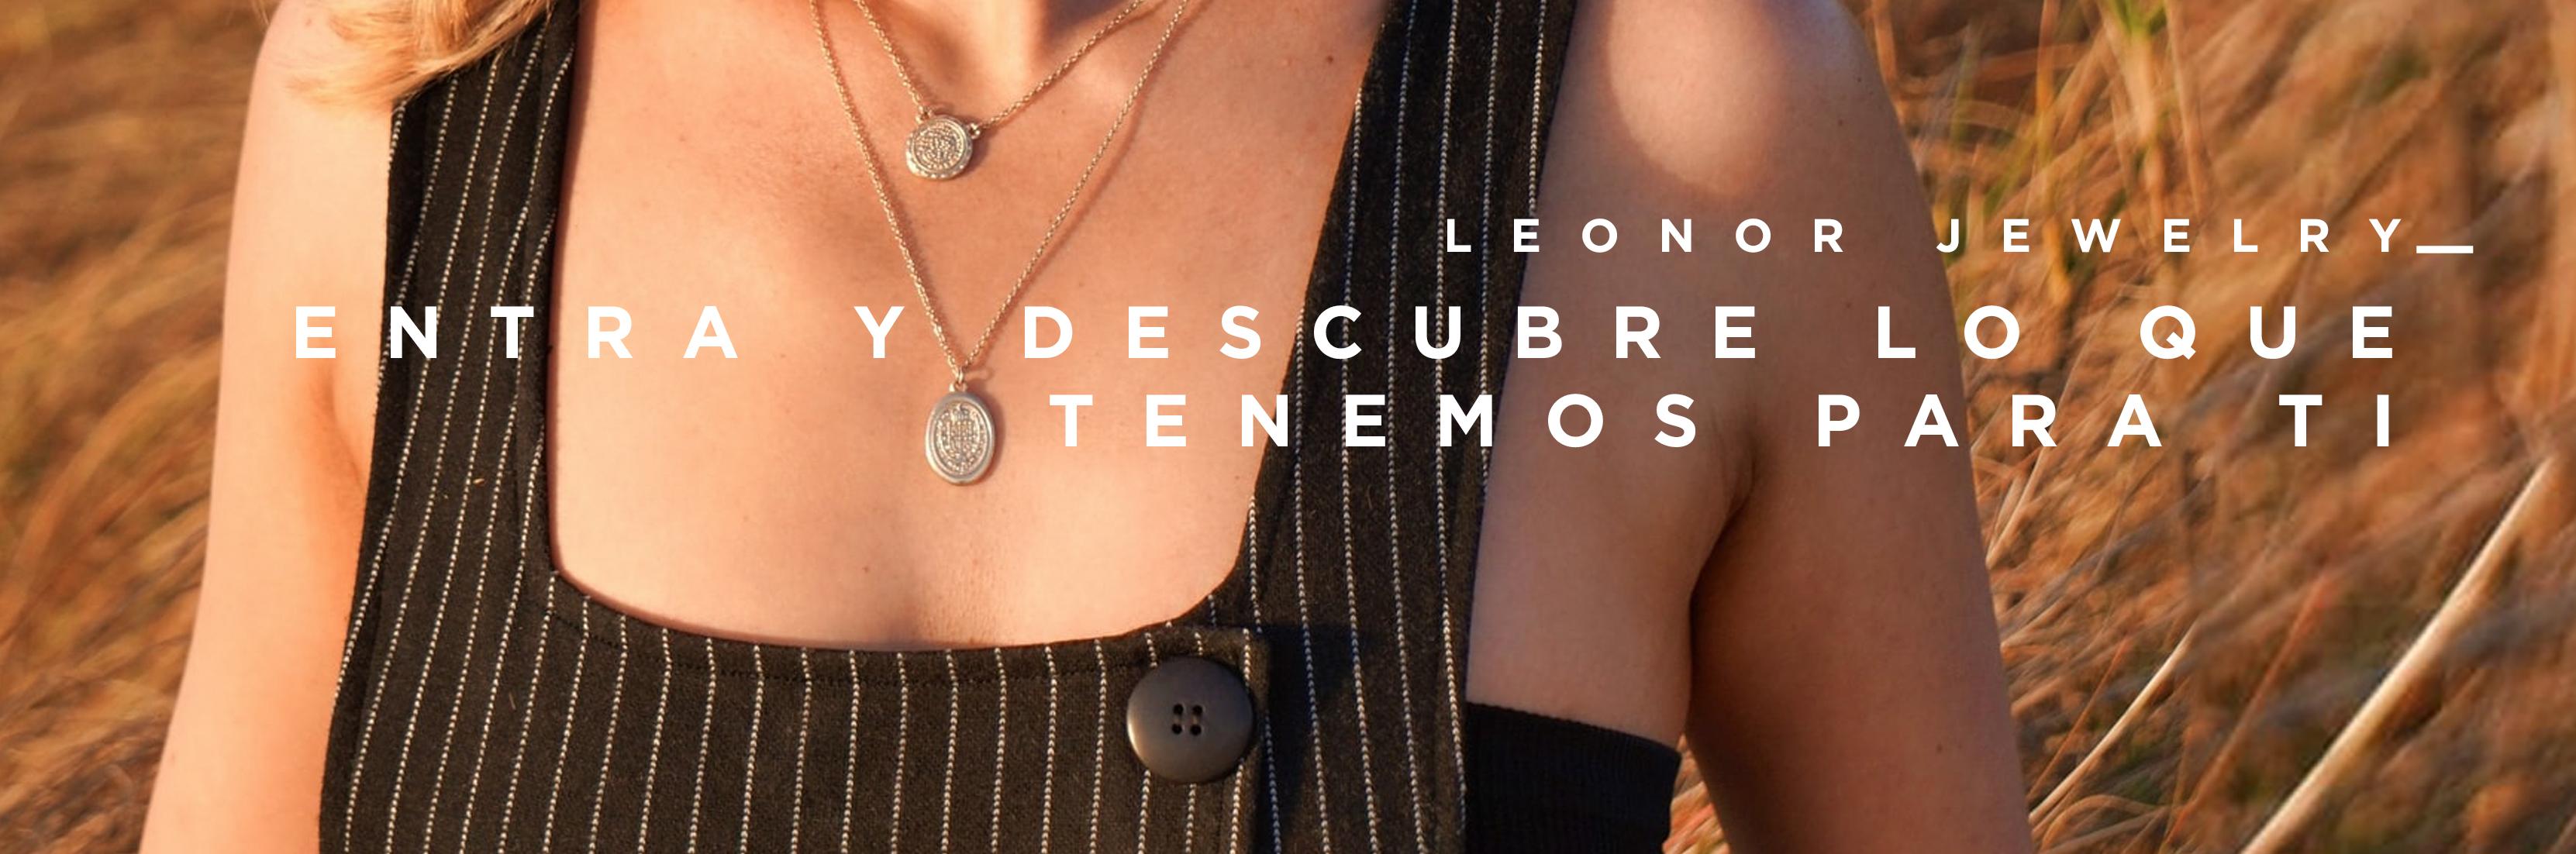 Collar Leonor jewelry